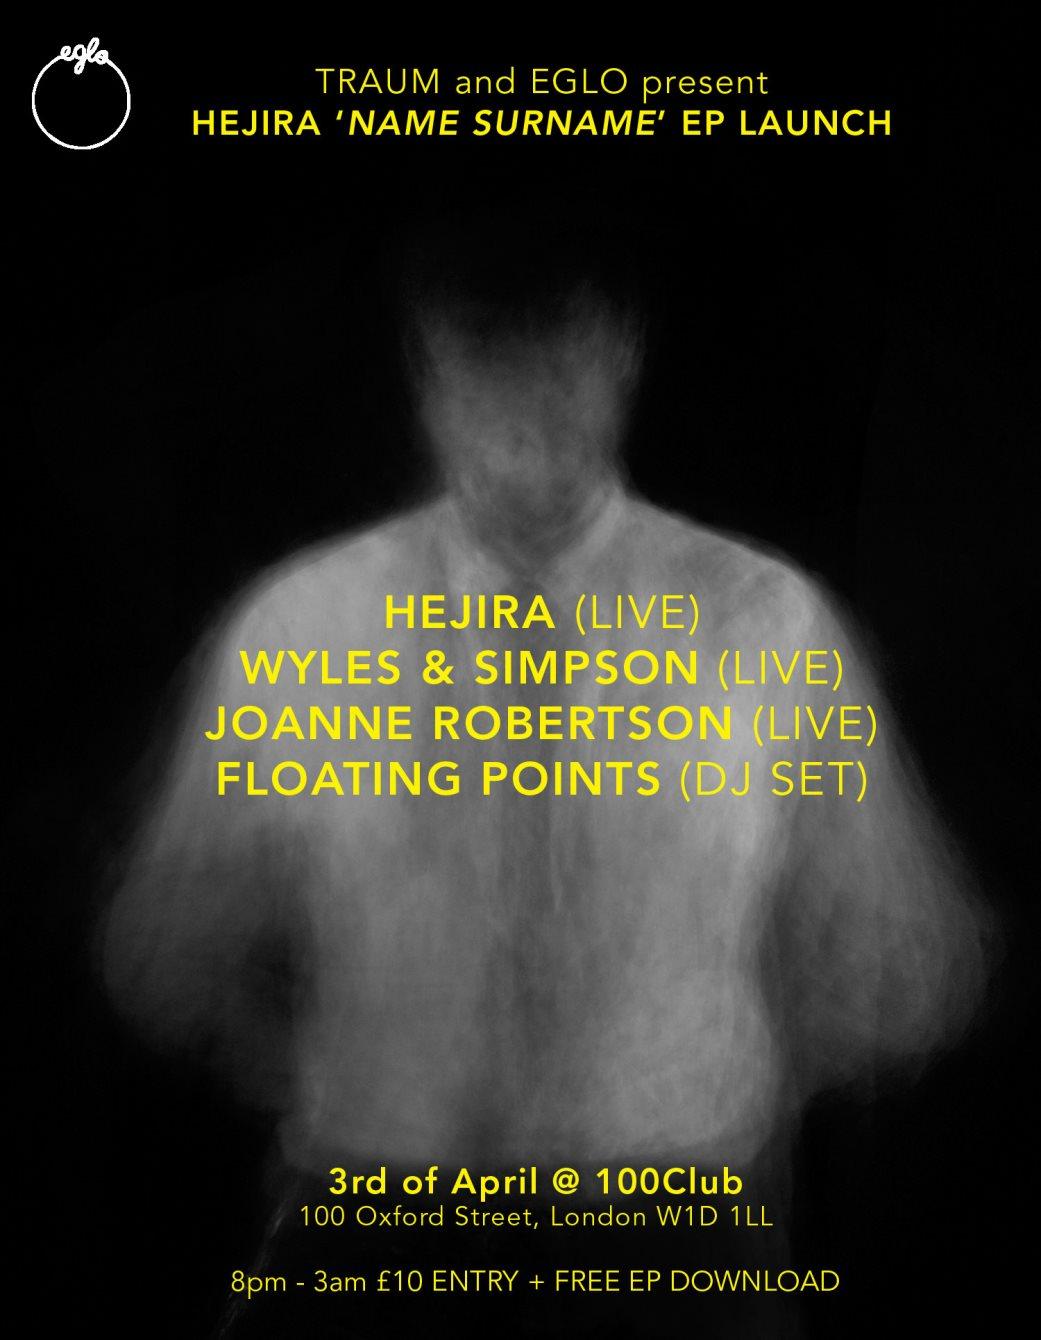 Traum + Eglo presents Hejira + Floating Points + Joanne Robertson + Wyles & Simpson - Flyer front